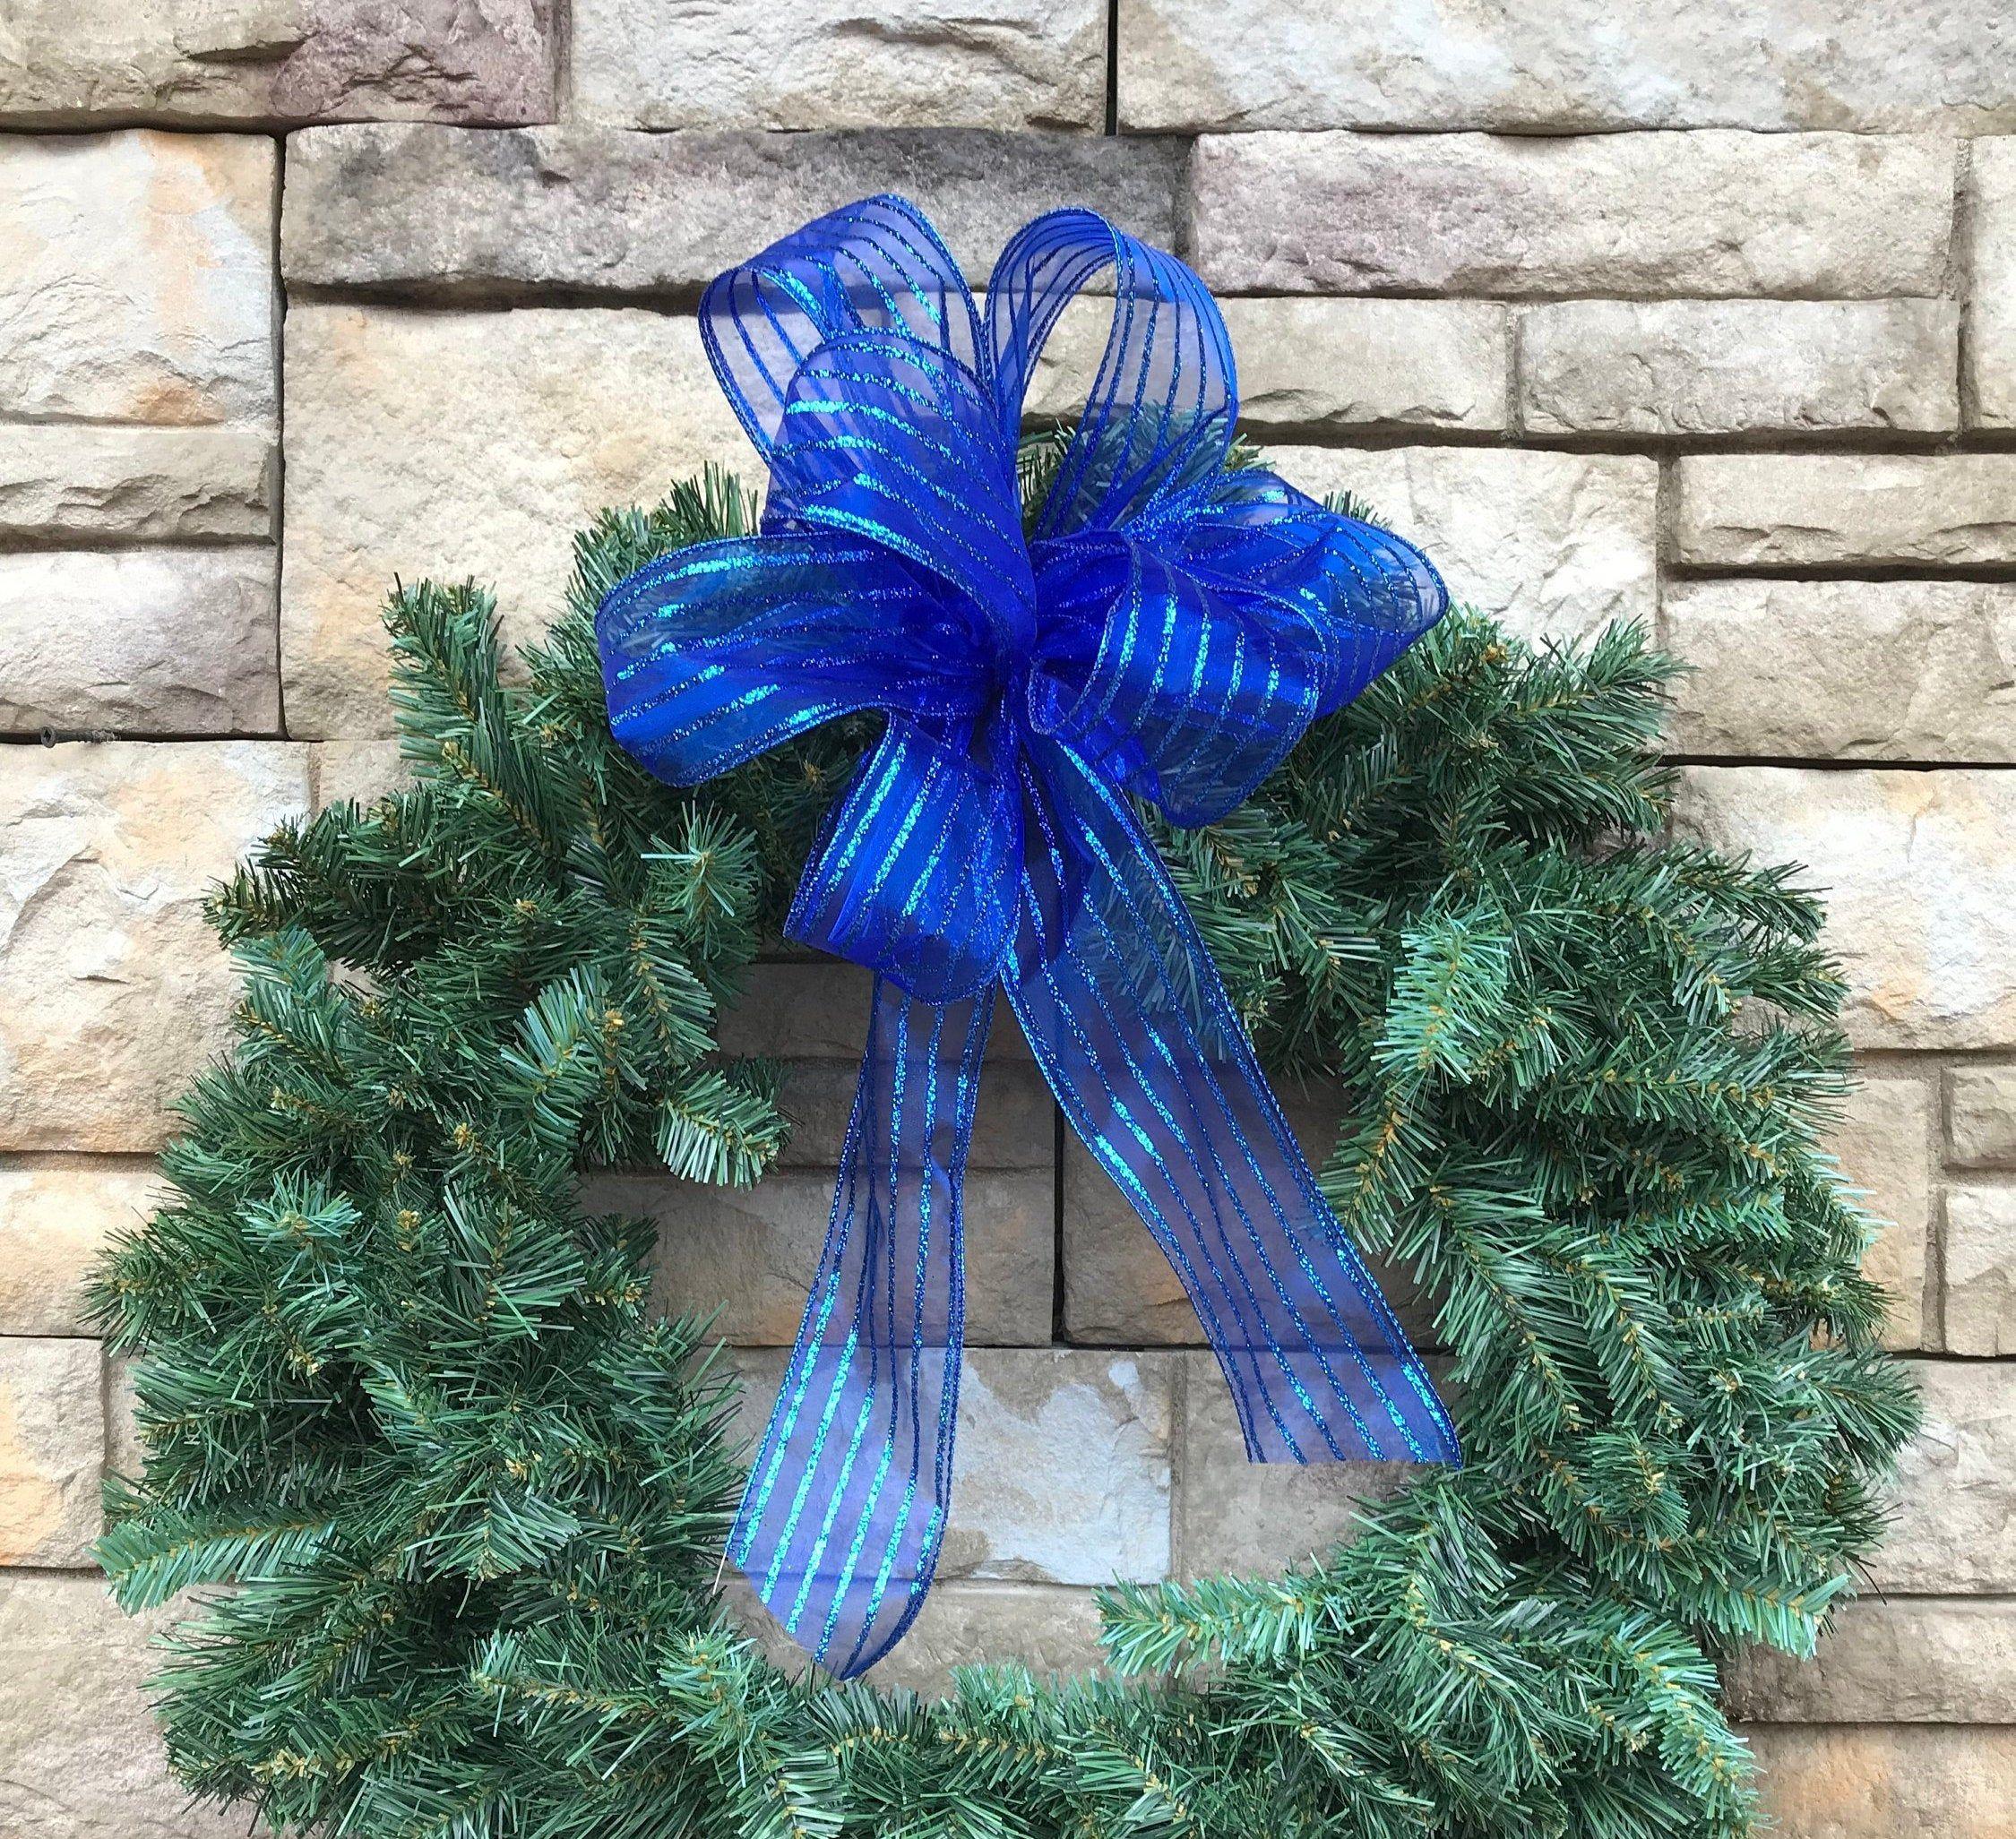 4 Large Sparkling Royal Blue Organza Christmas Bow Blue Wreath Ribbon Blue Christmas Bow Blue Christmas Decoration Royal Blue Organza Bow Blue Christmas Decor Blue Wreath Christmas Bows